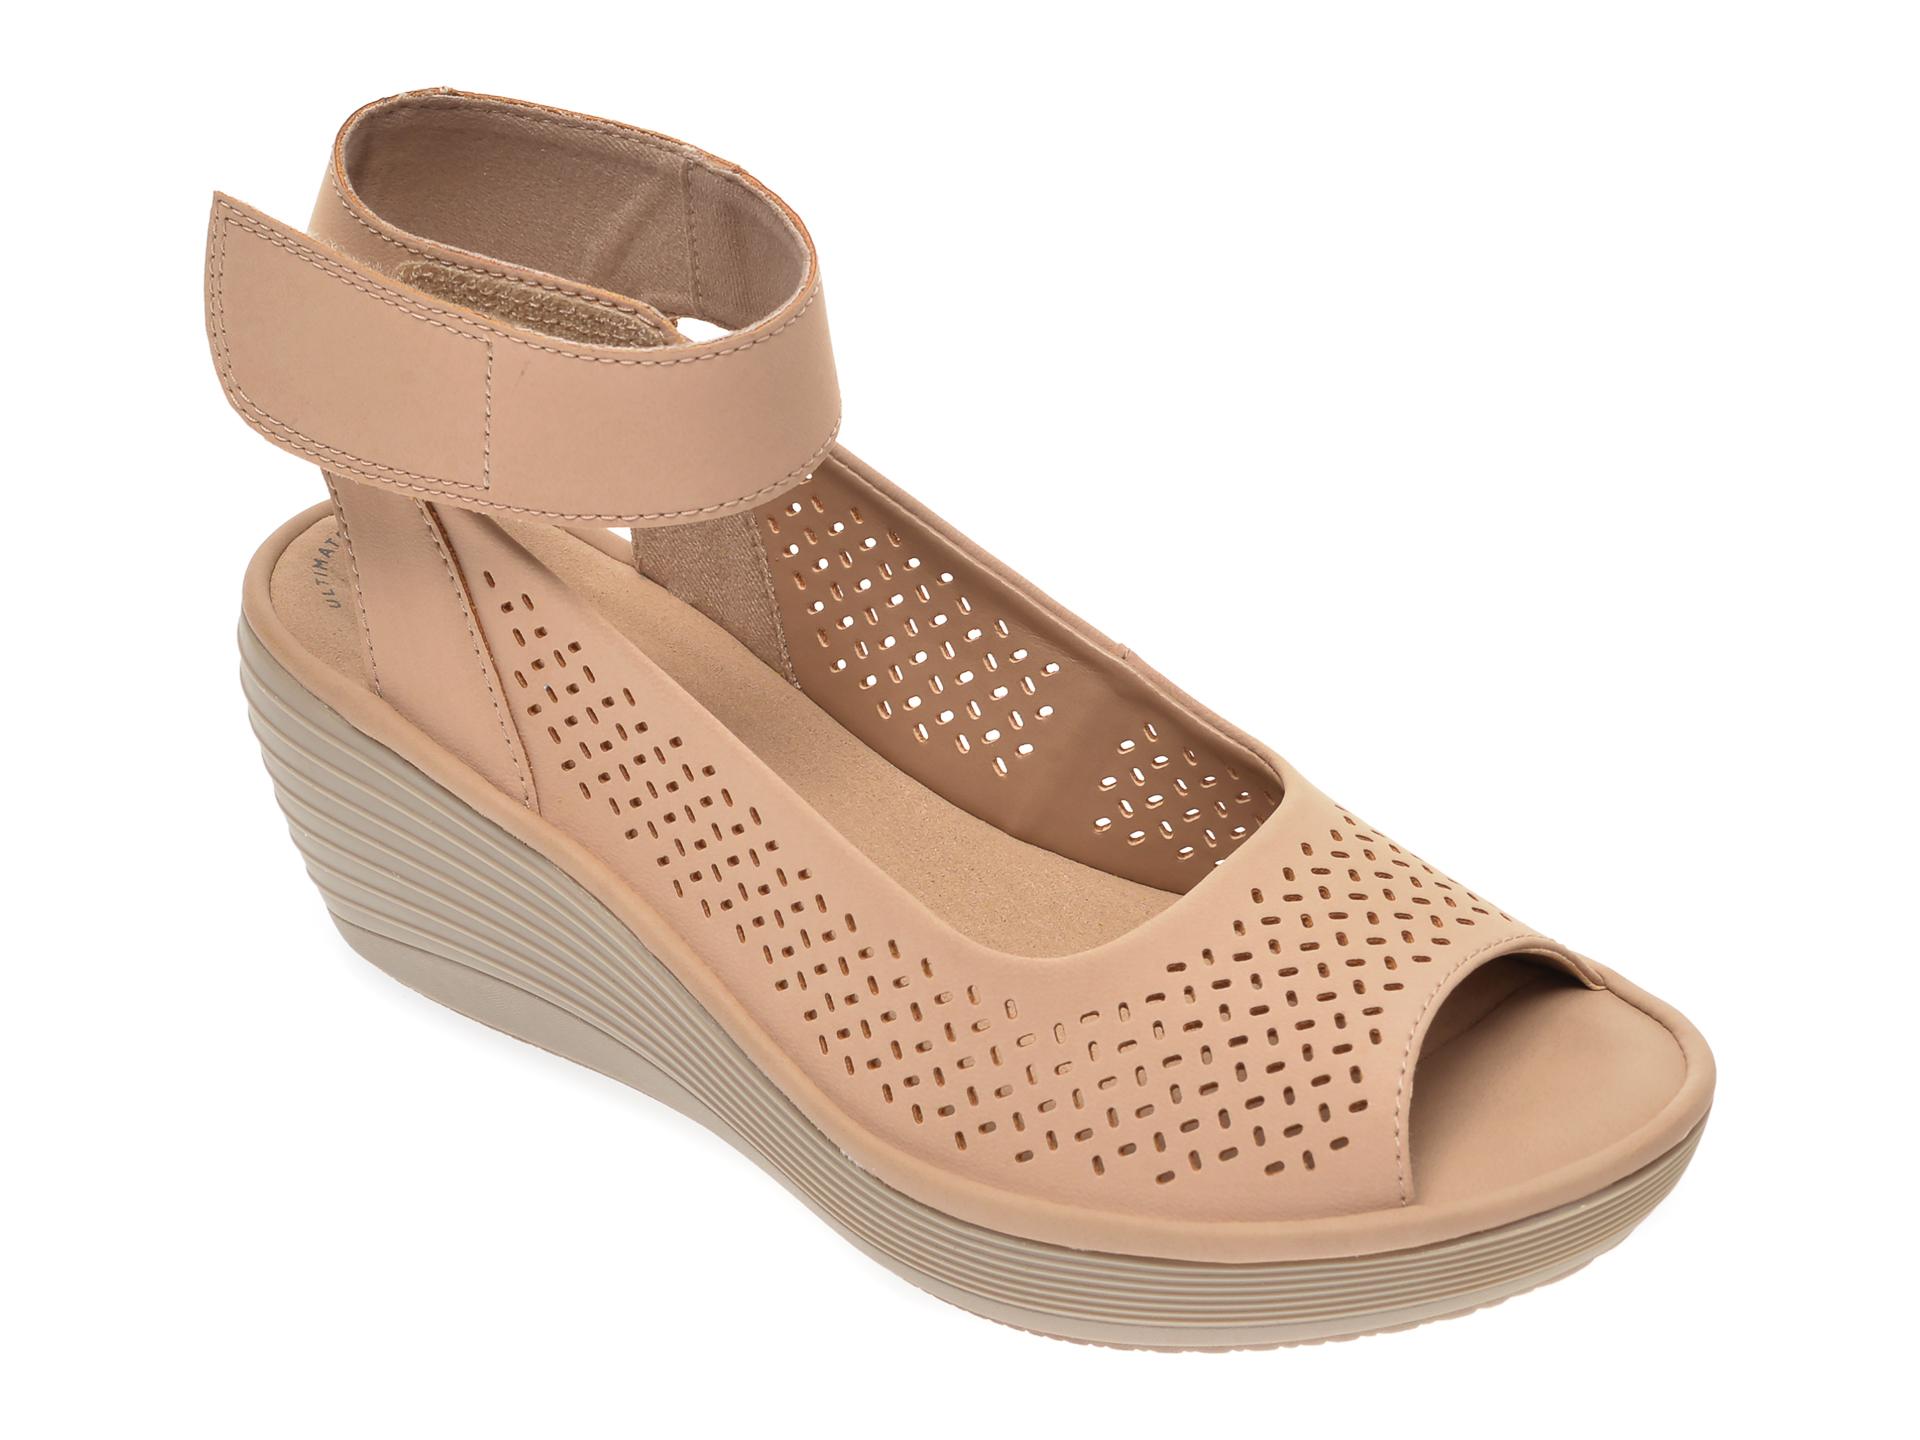 Sandale CLARKS nude, Reedly Jump, din nabuc